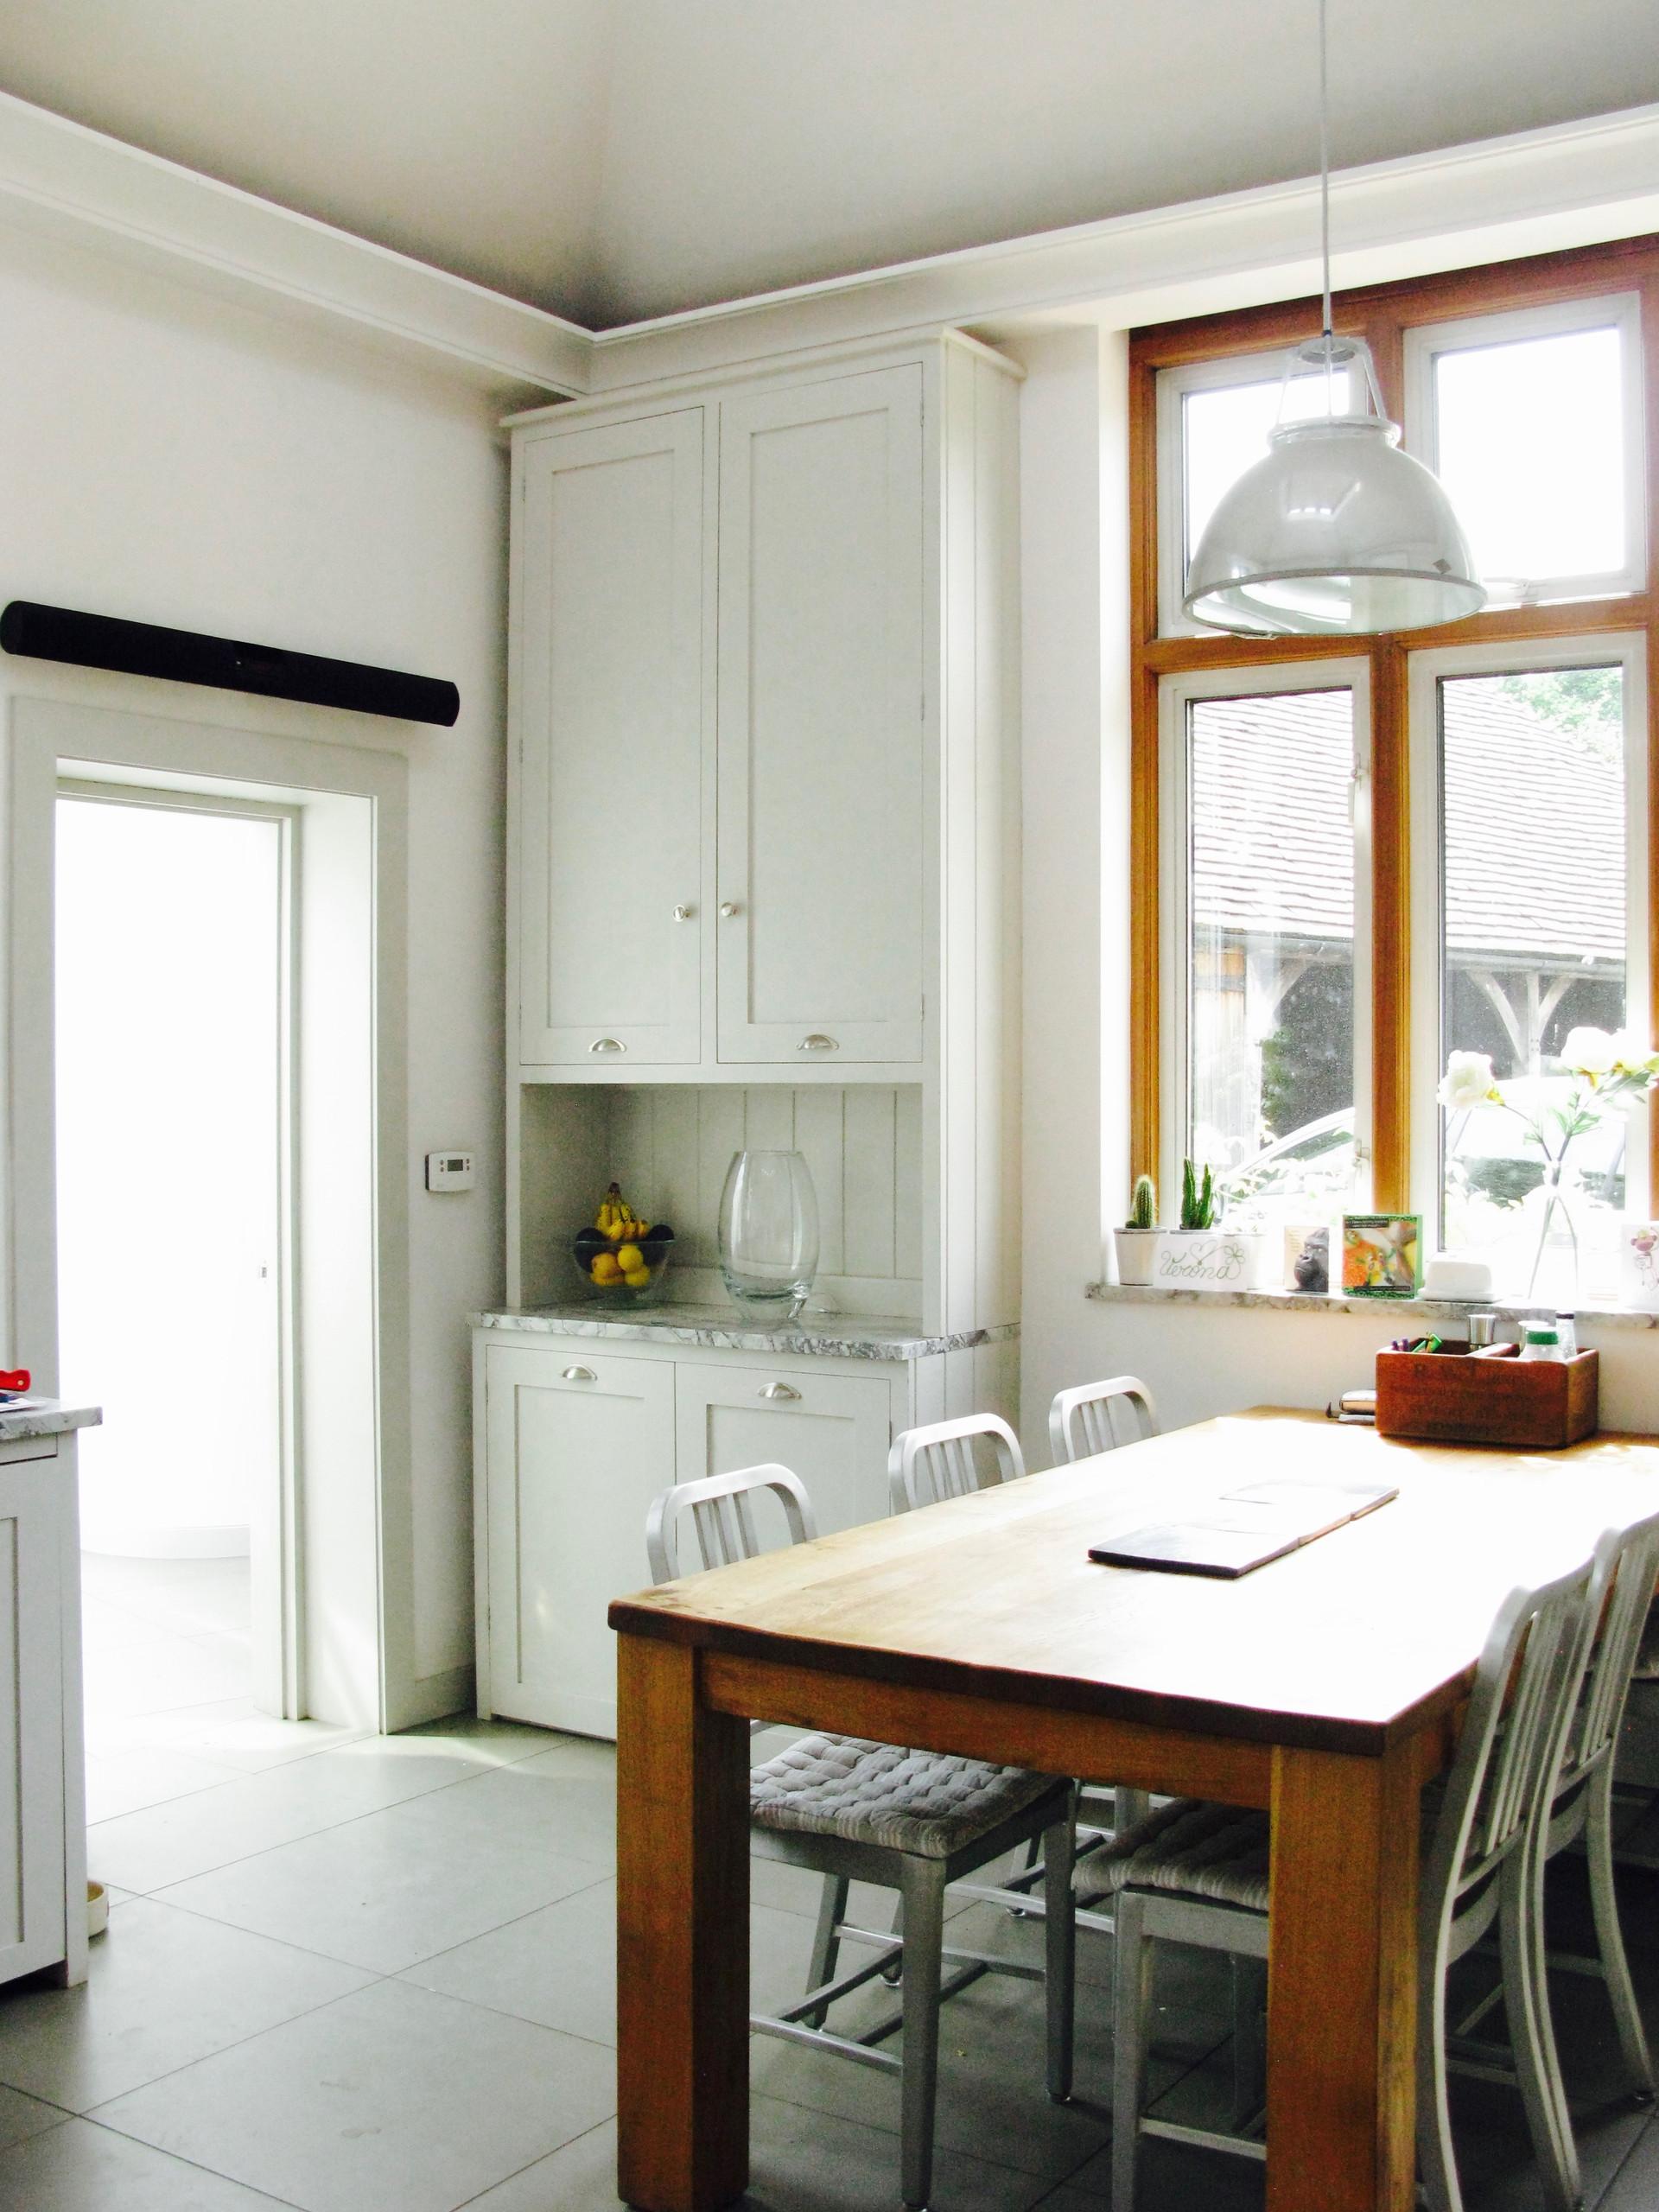 The Oast House | Brasted | © footprintdesignstudio | Architecture | Interior Design | Greenwich | London